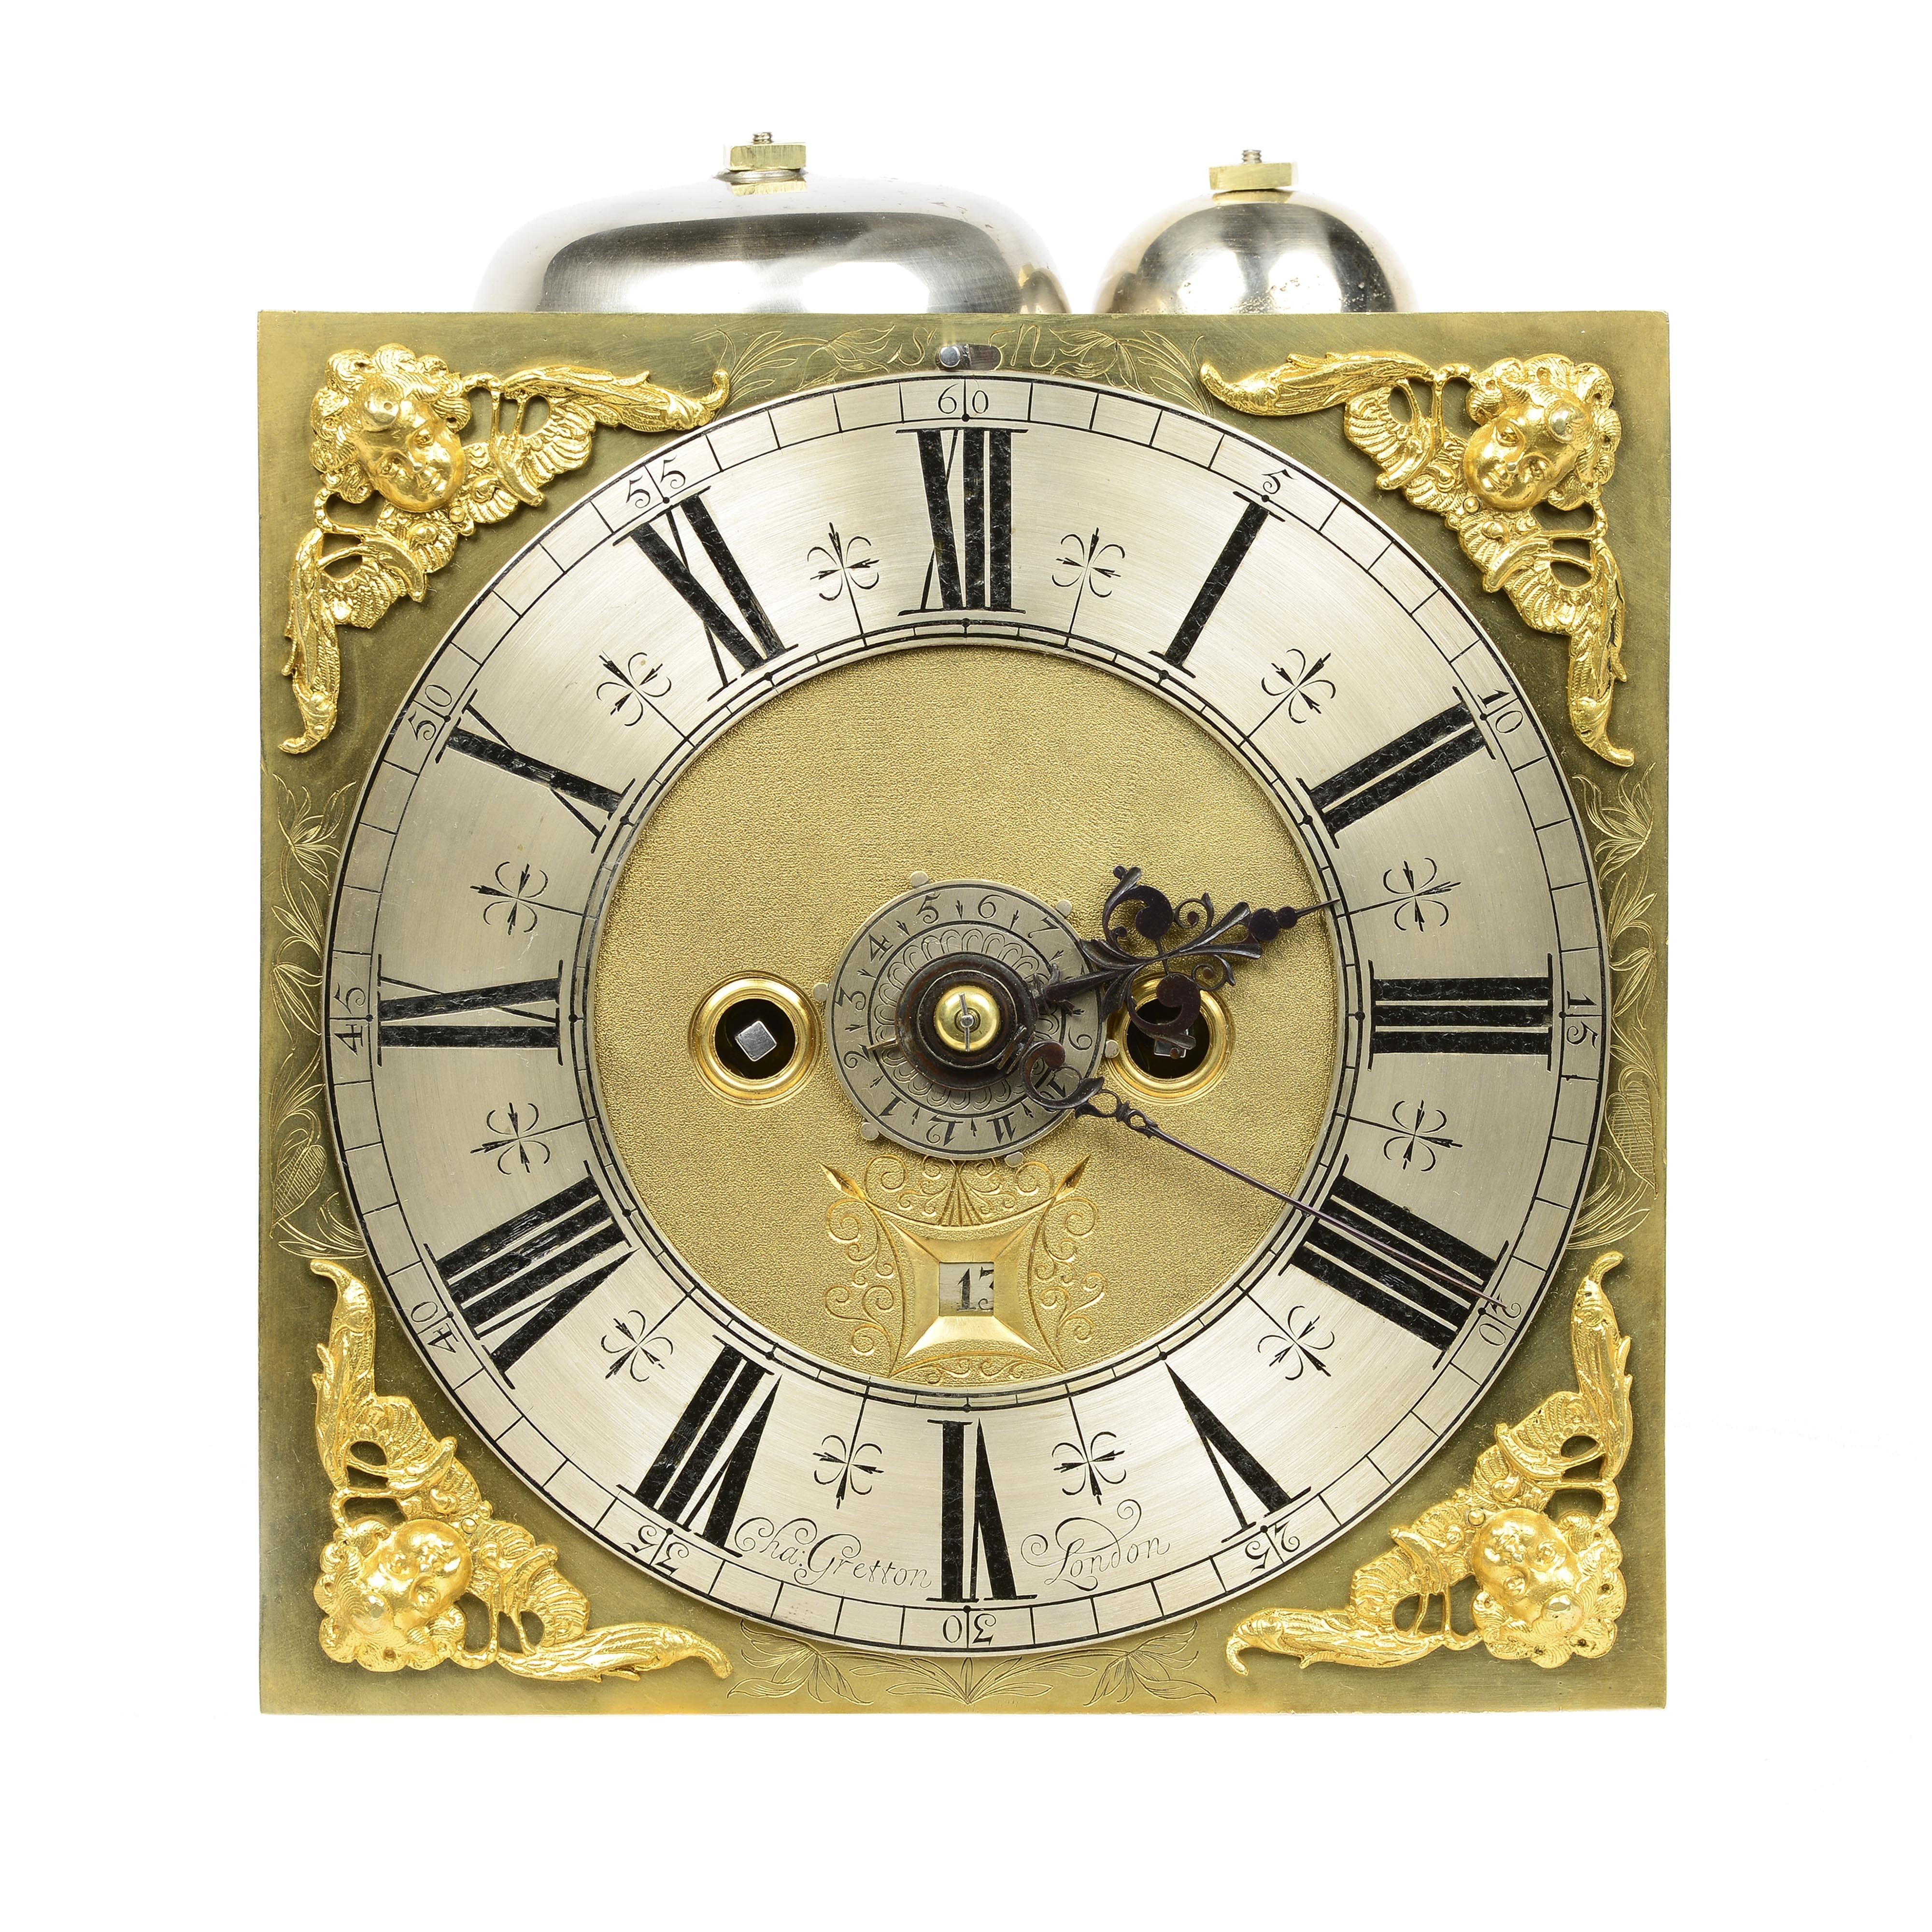 William Amp Mary Ebony Basket Top Bracket Clock By Charles